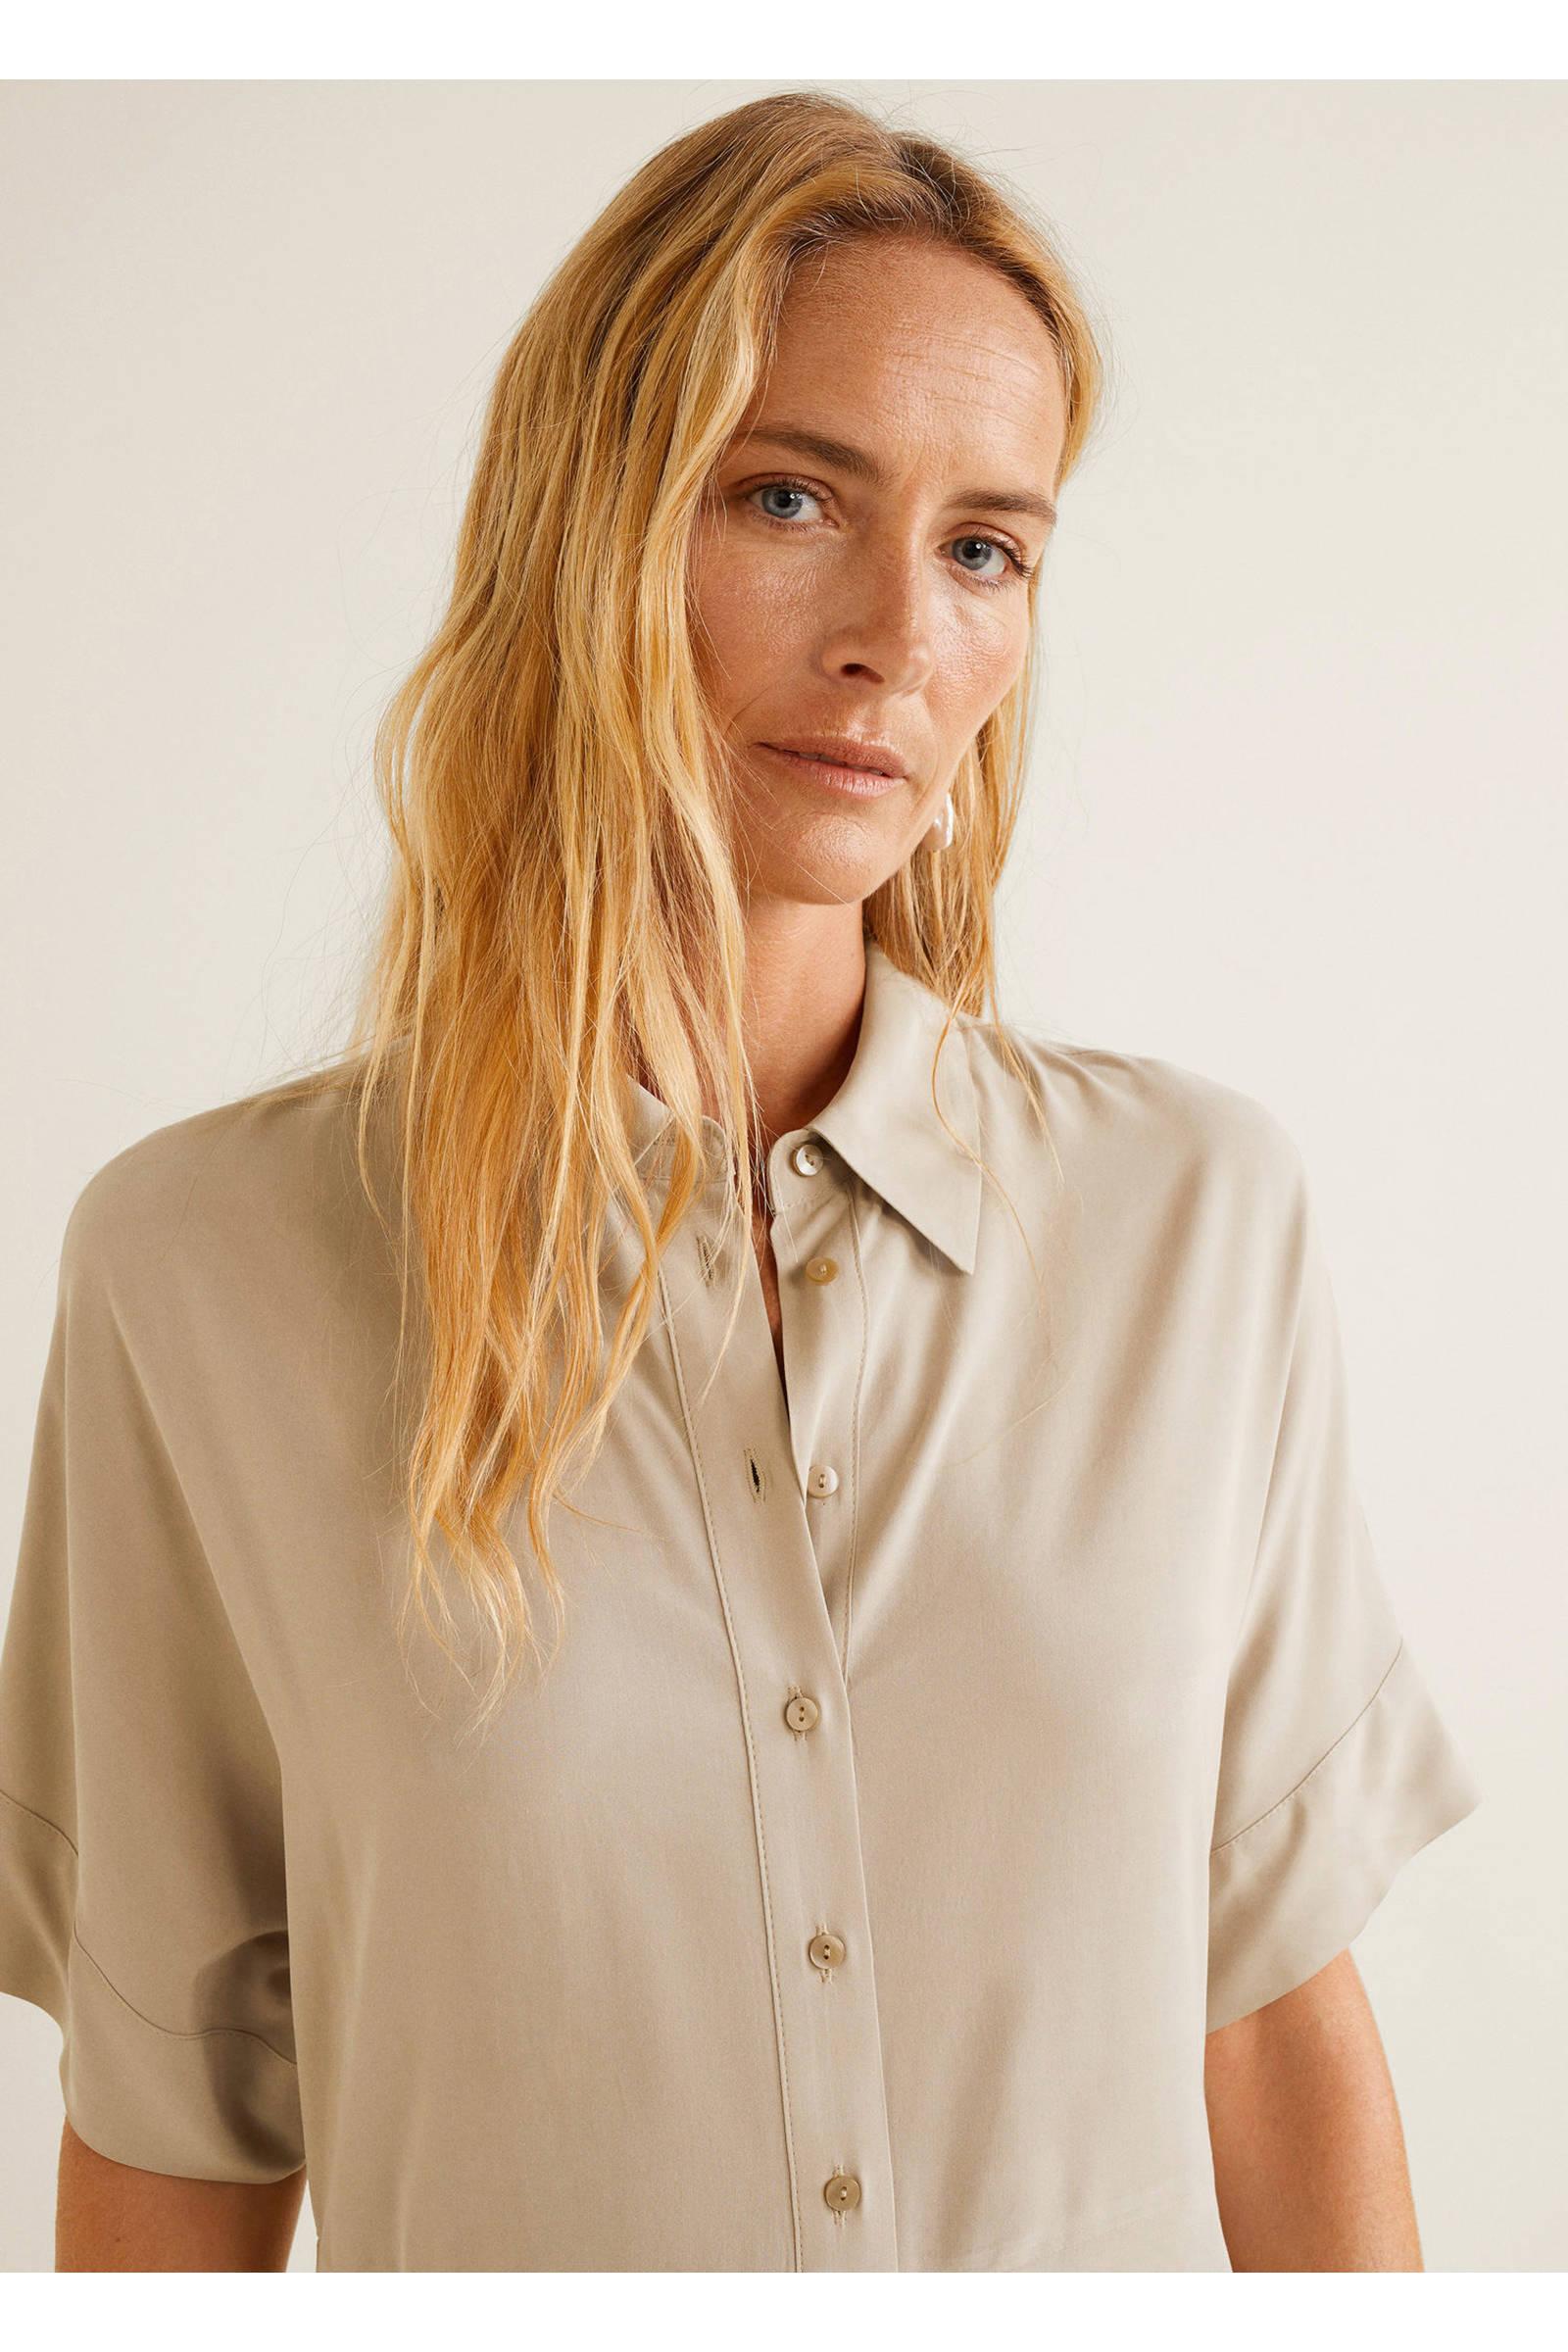 001005deade438 Mango getailleerde blousejurk beige